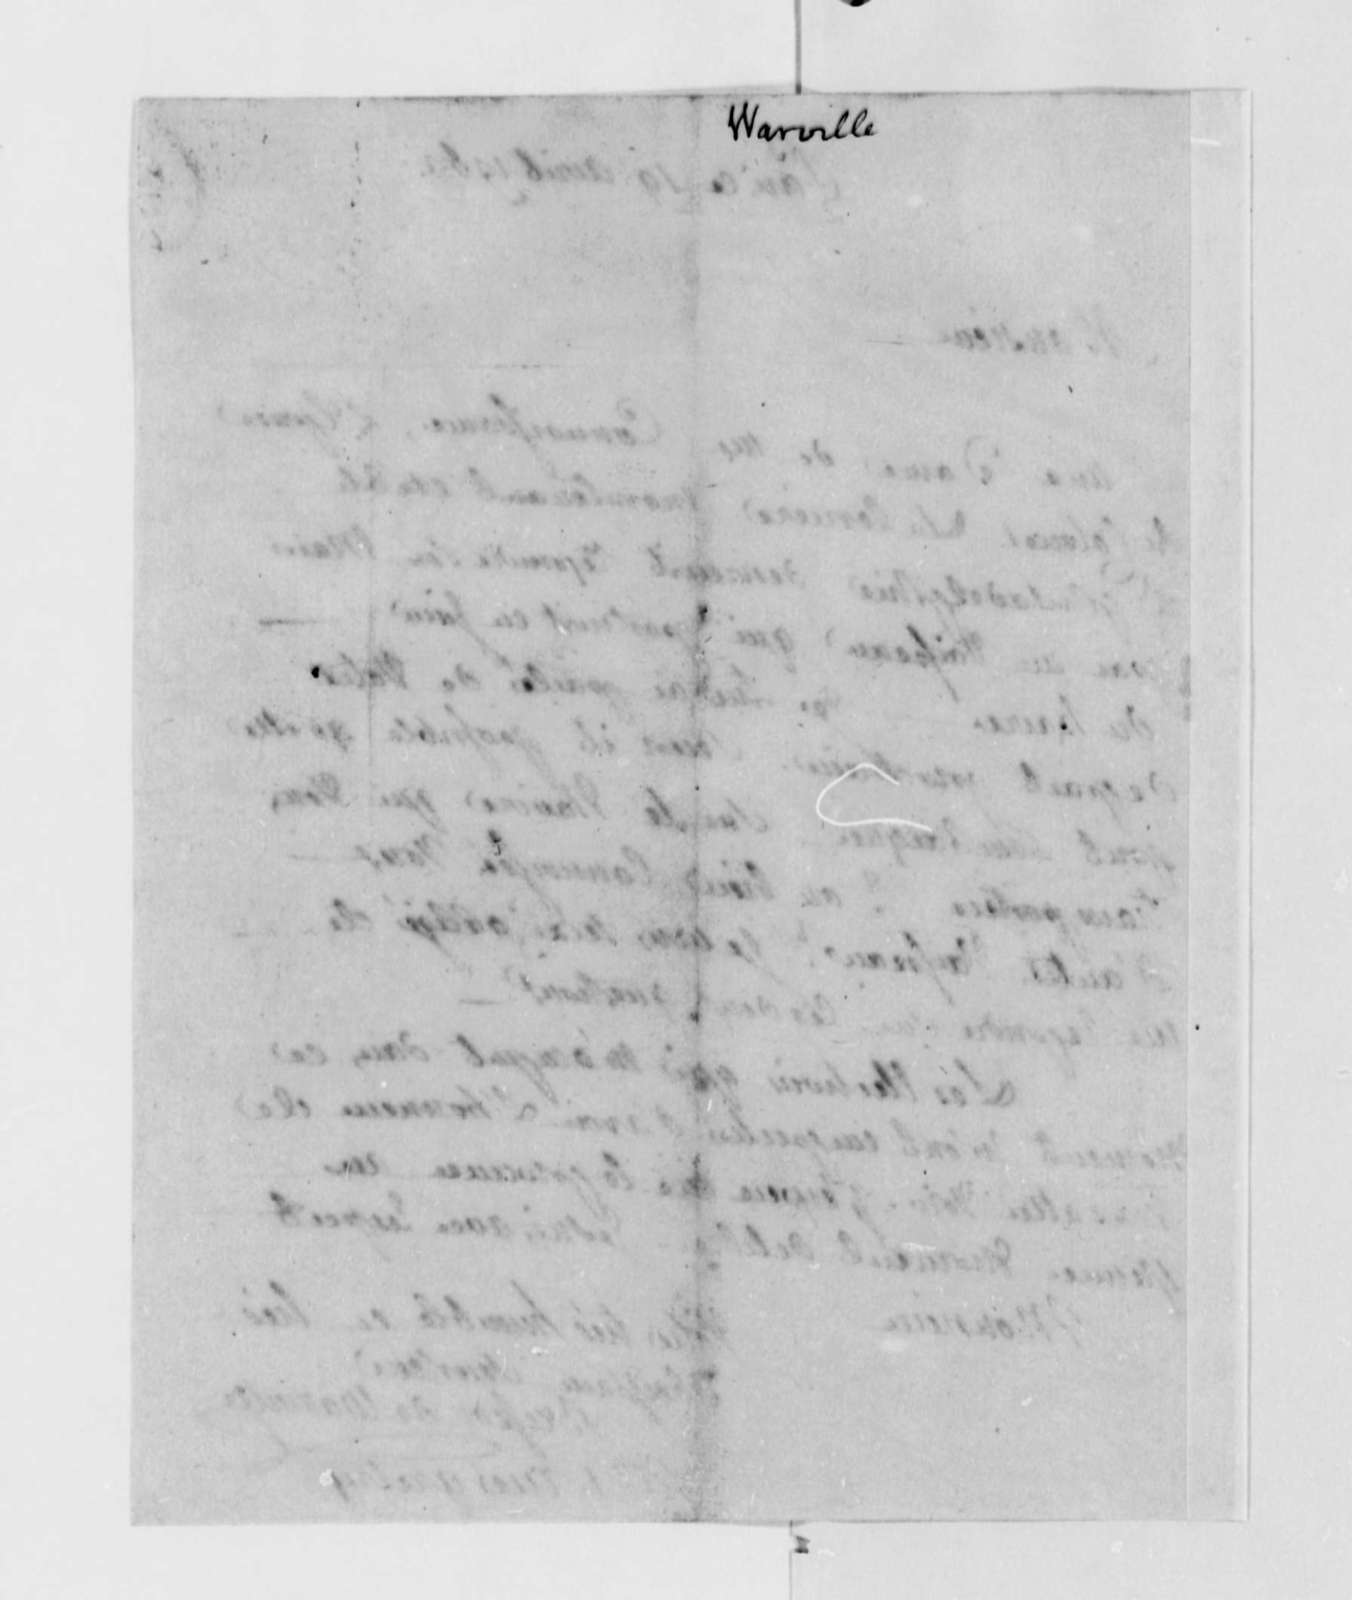 Jean Plumard Brissot de Warville to Thomas Jefferson, April 19, 1789